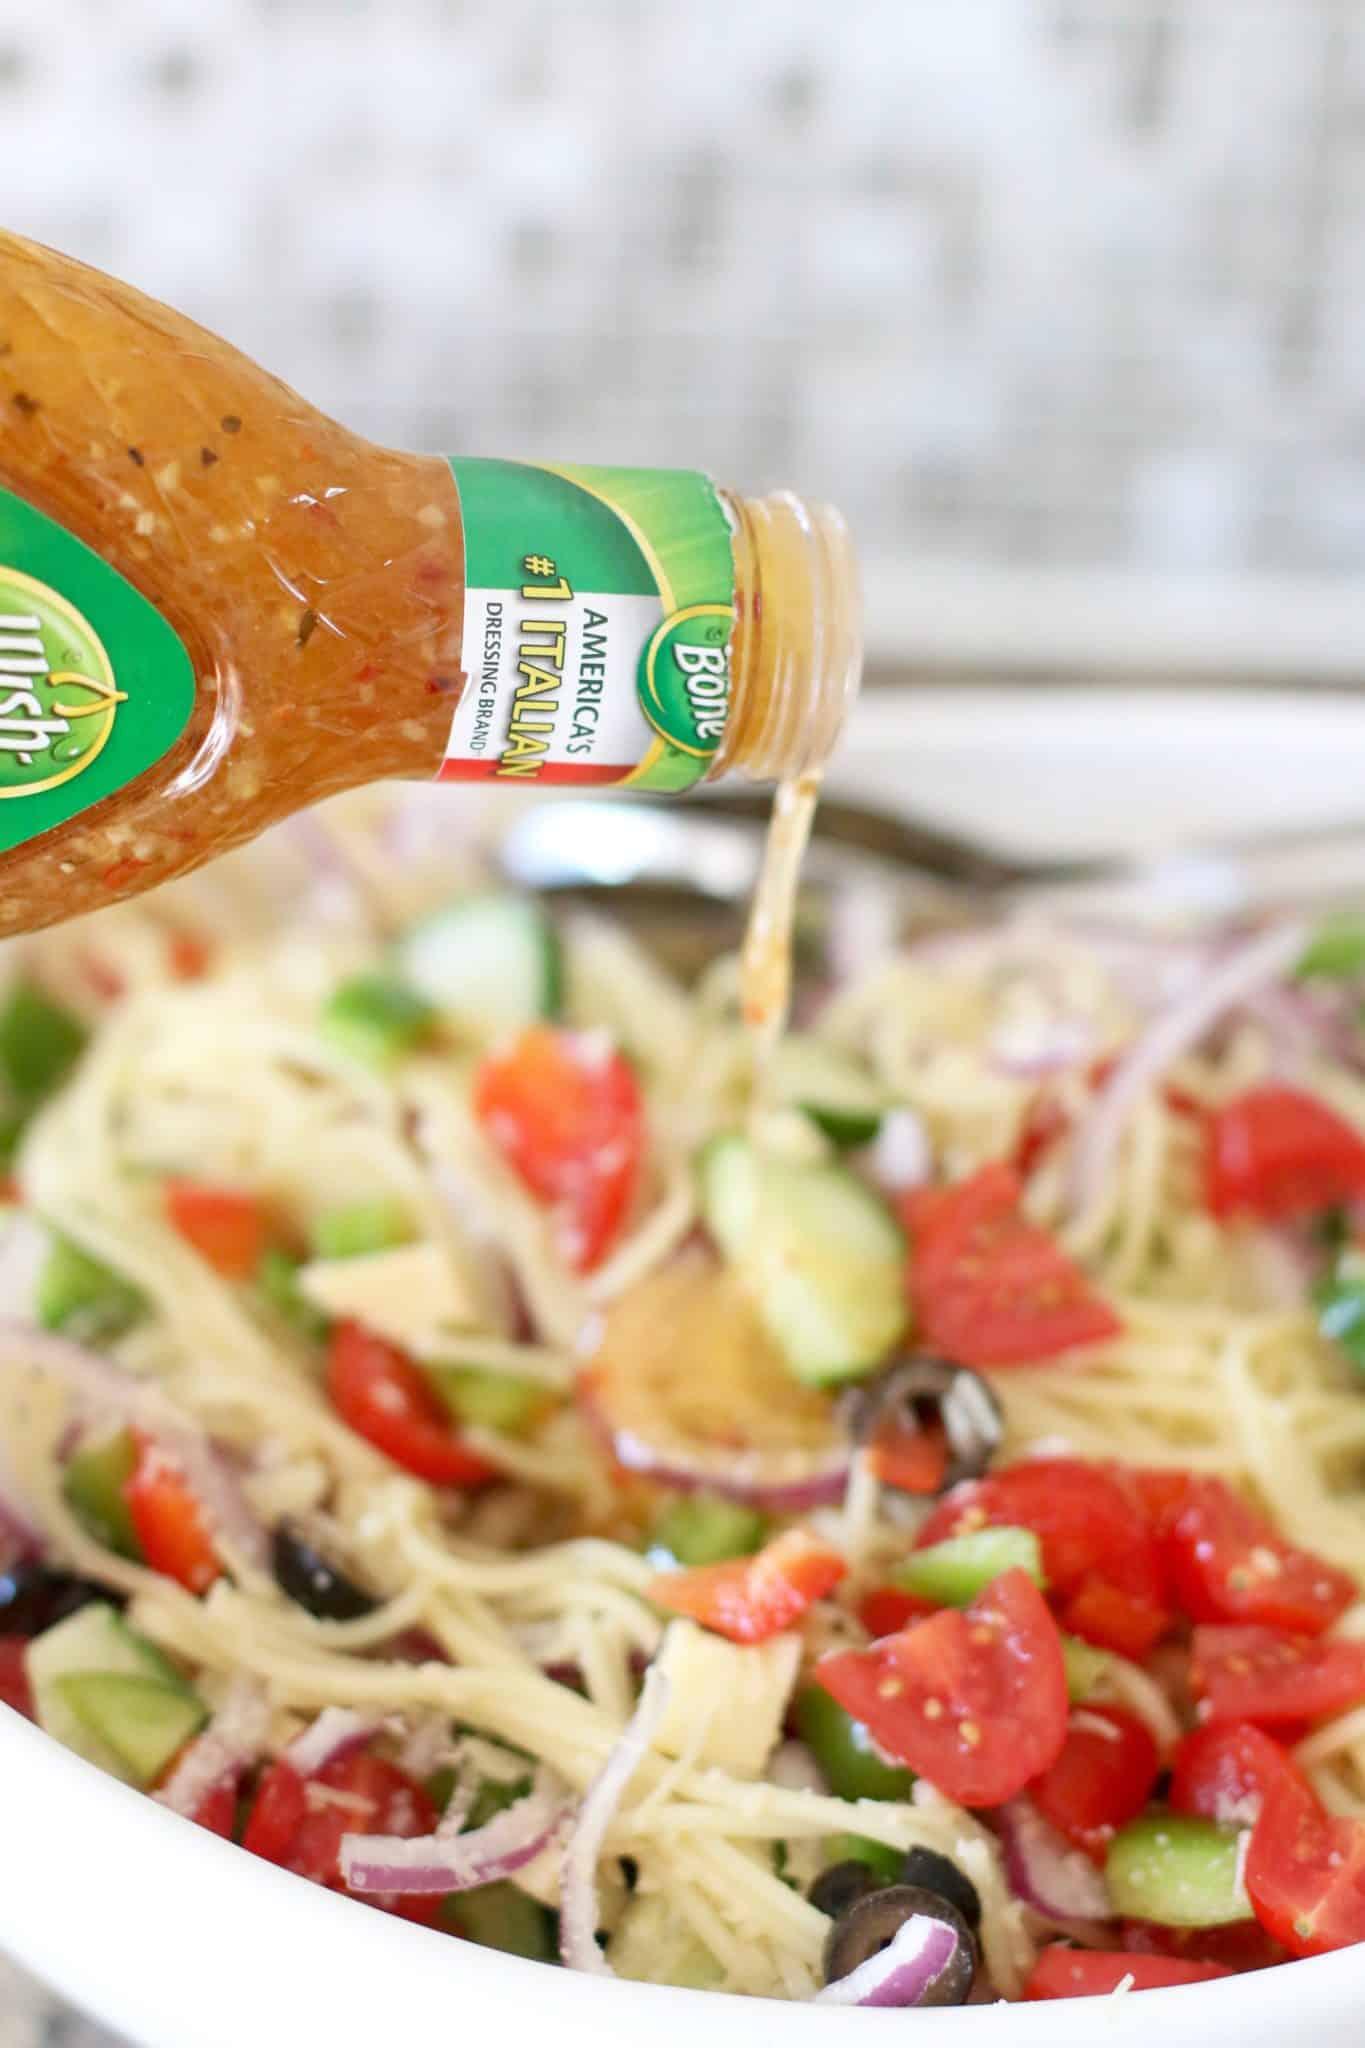 wish Bone Zest Italian Dressing poured over prepared spaghetti noodle salad